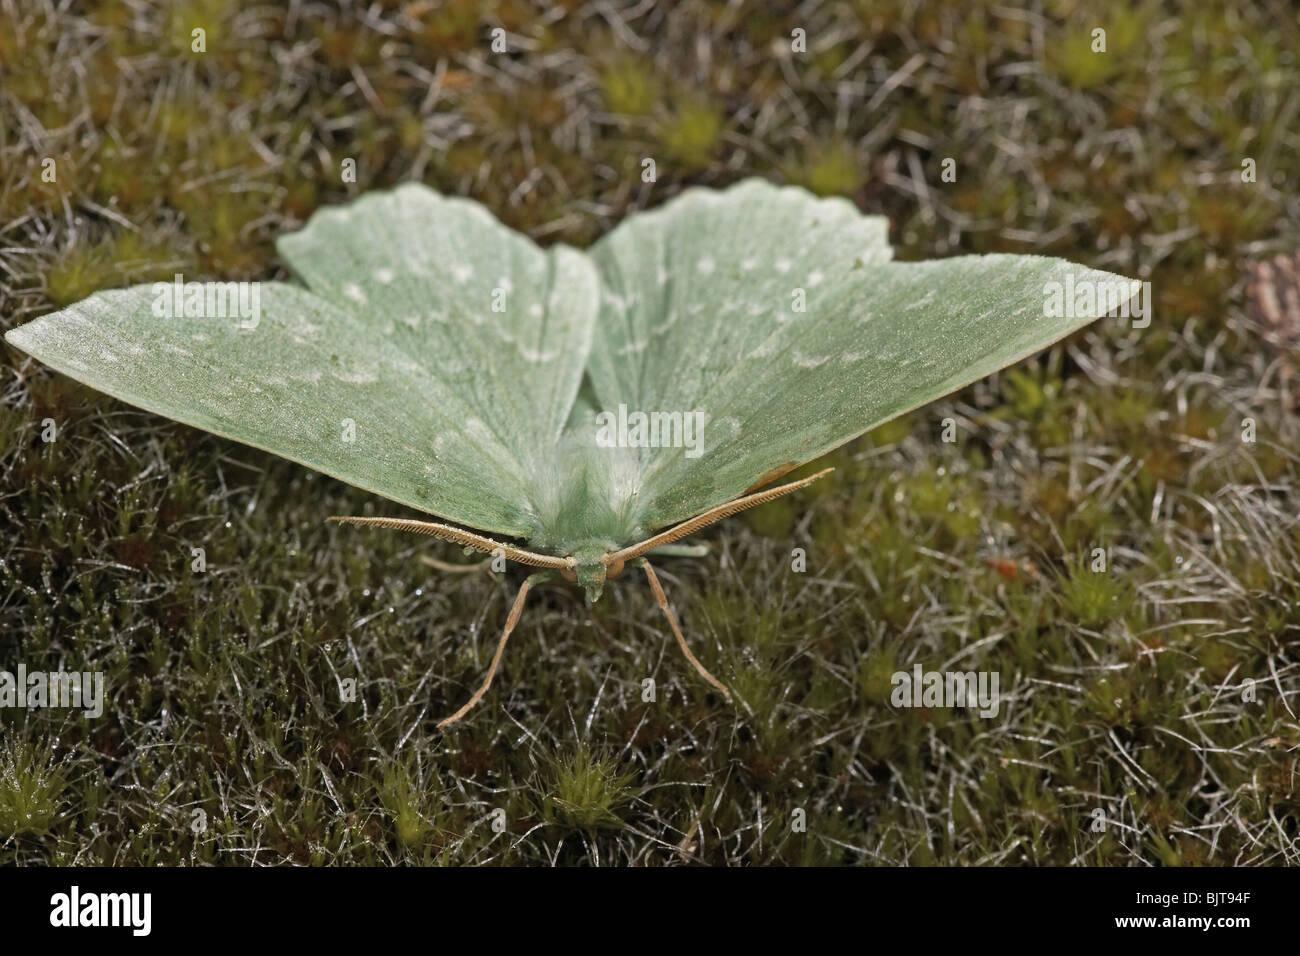 Großer Smaragd, Geometra Papilionaria, Motte UK Stockbild